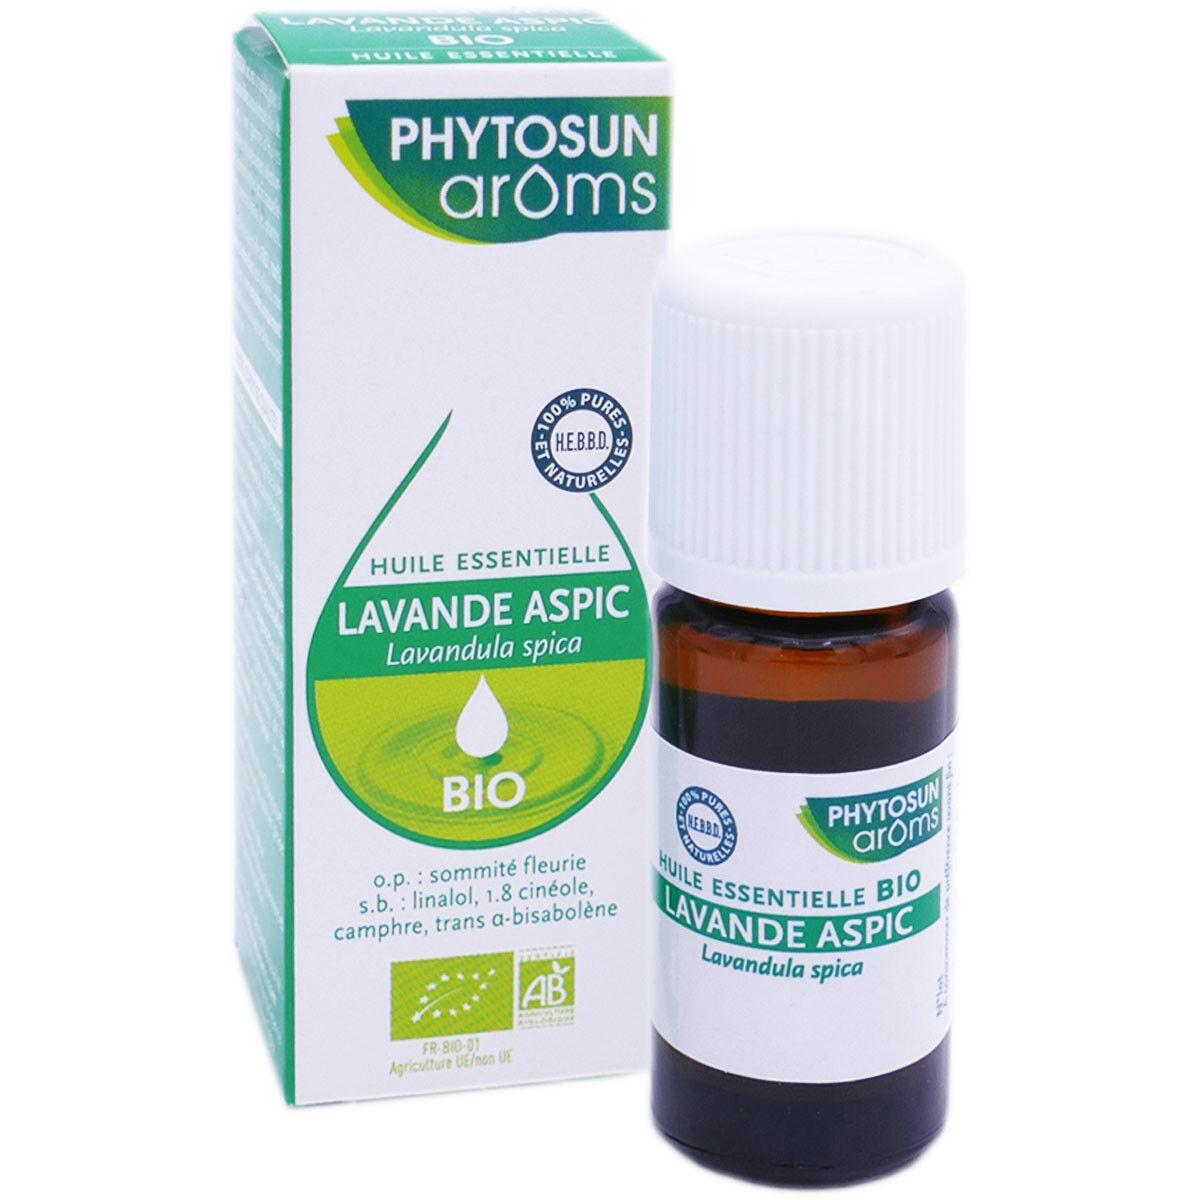 Phytosun aroms he lavande aspic bio 10 ml